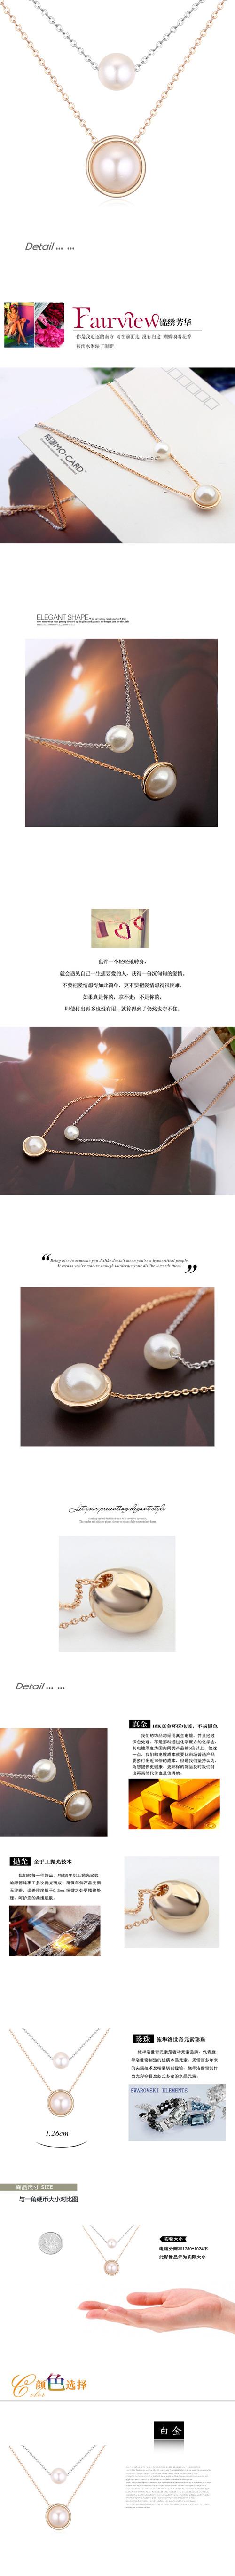 Austria beads necklace 19400